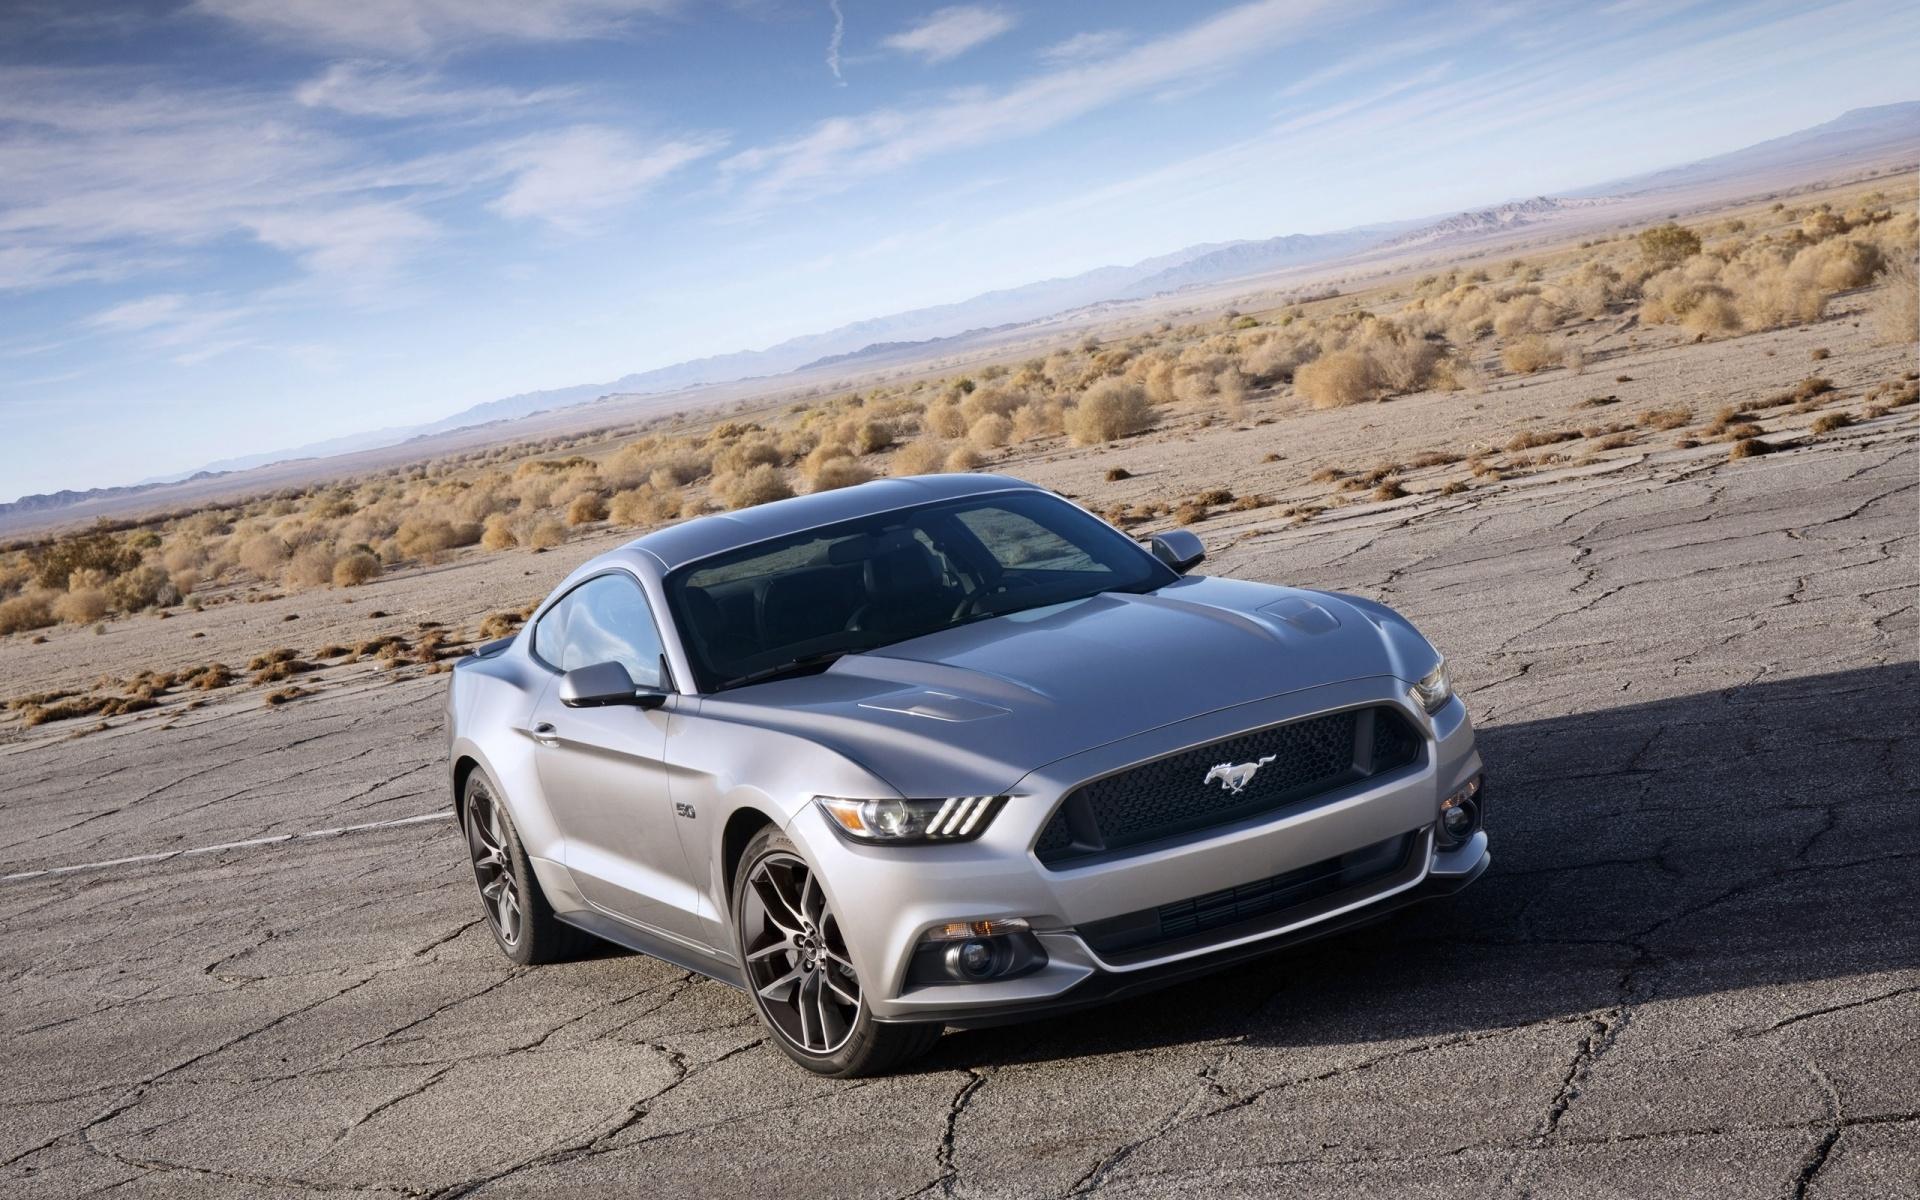 2015 Ford Mustang 4 Wallpaper HD Car Wallpapers 1920x1200